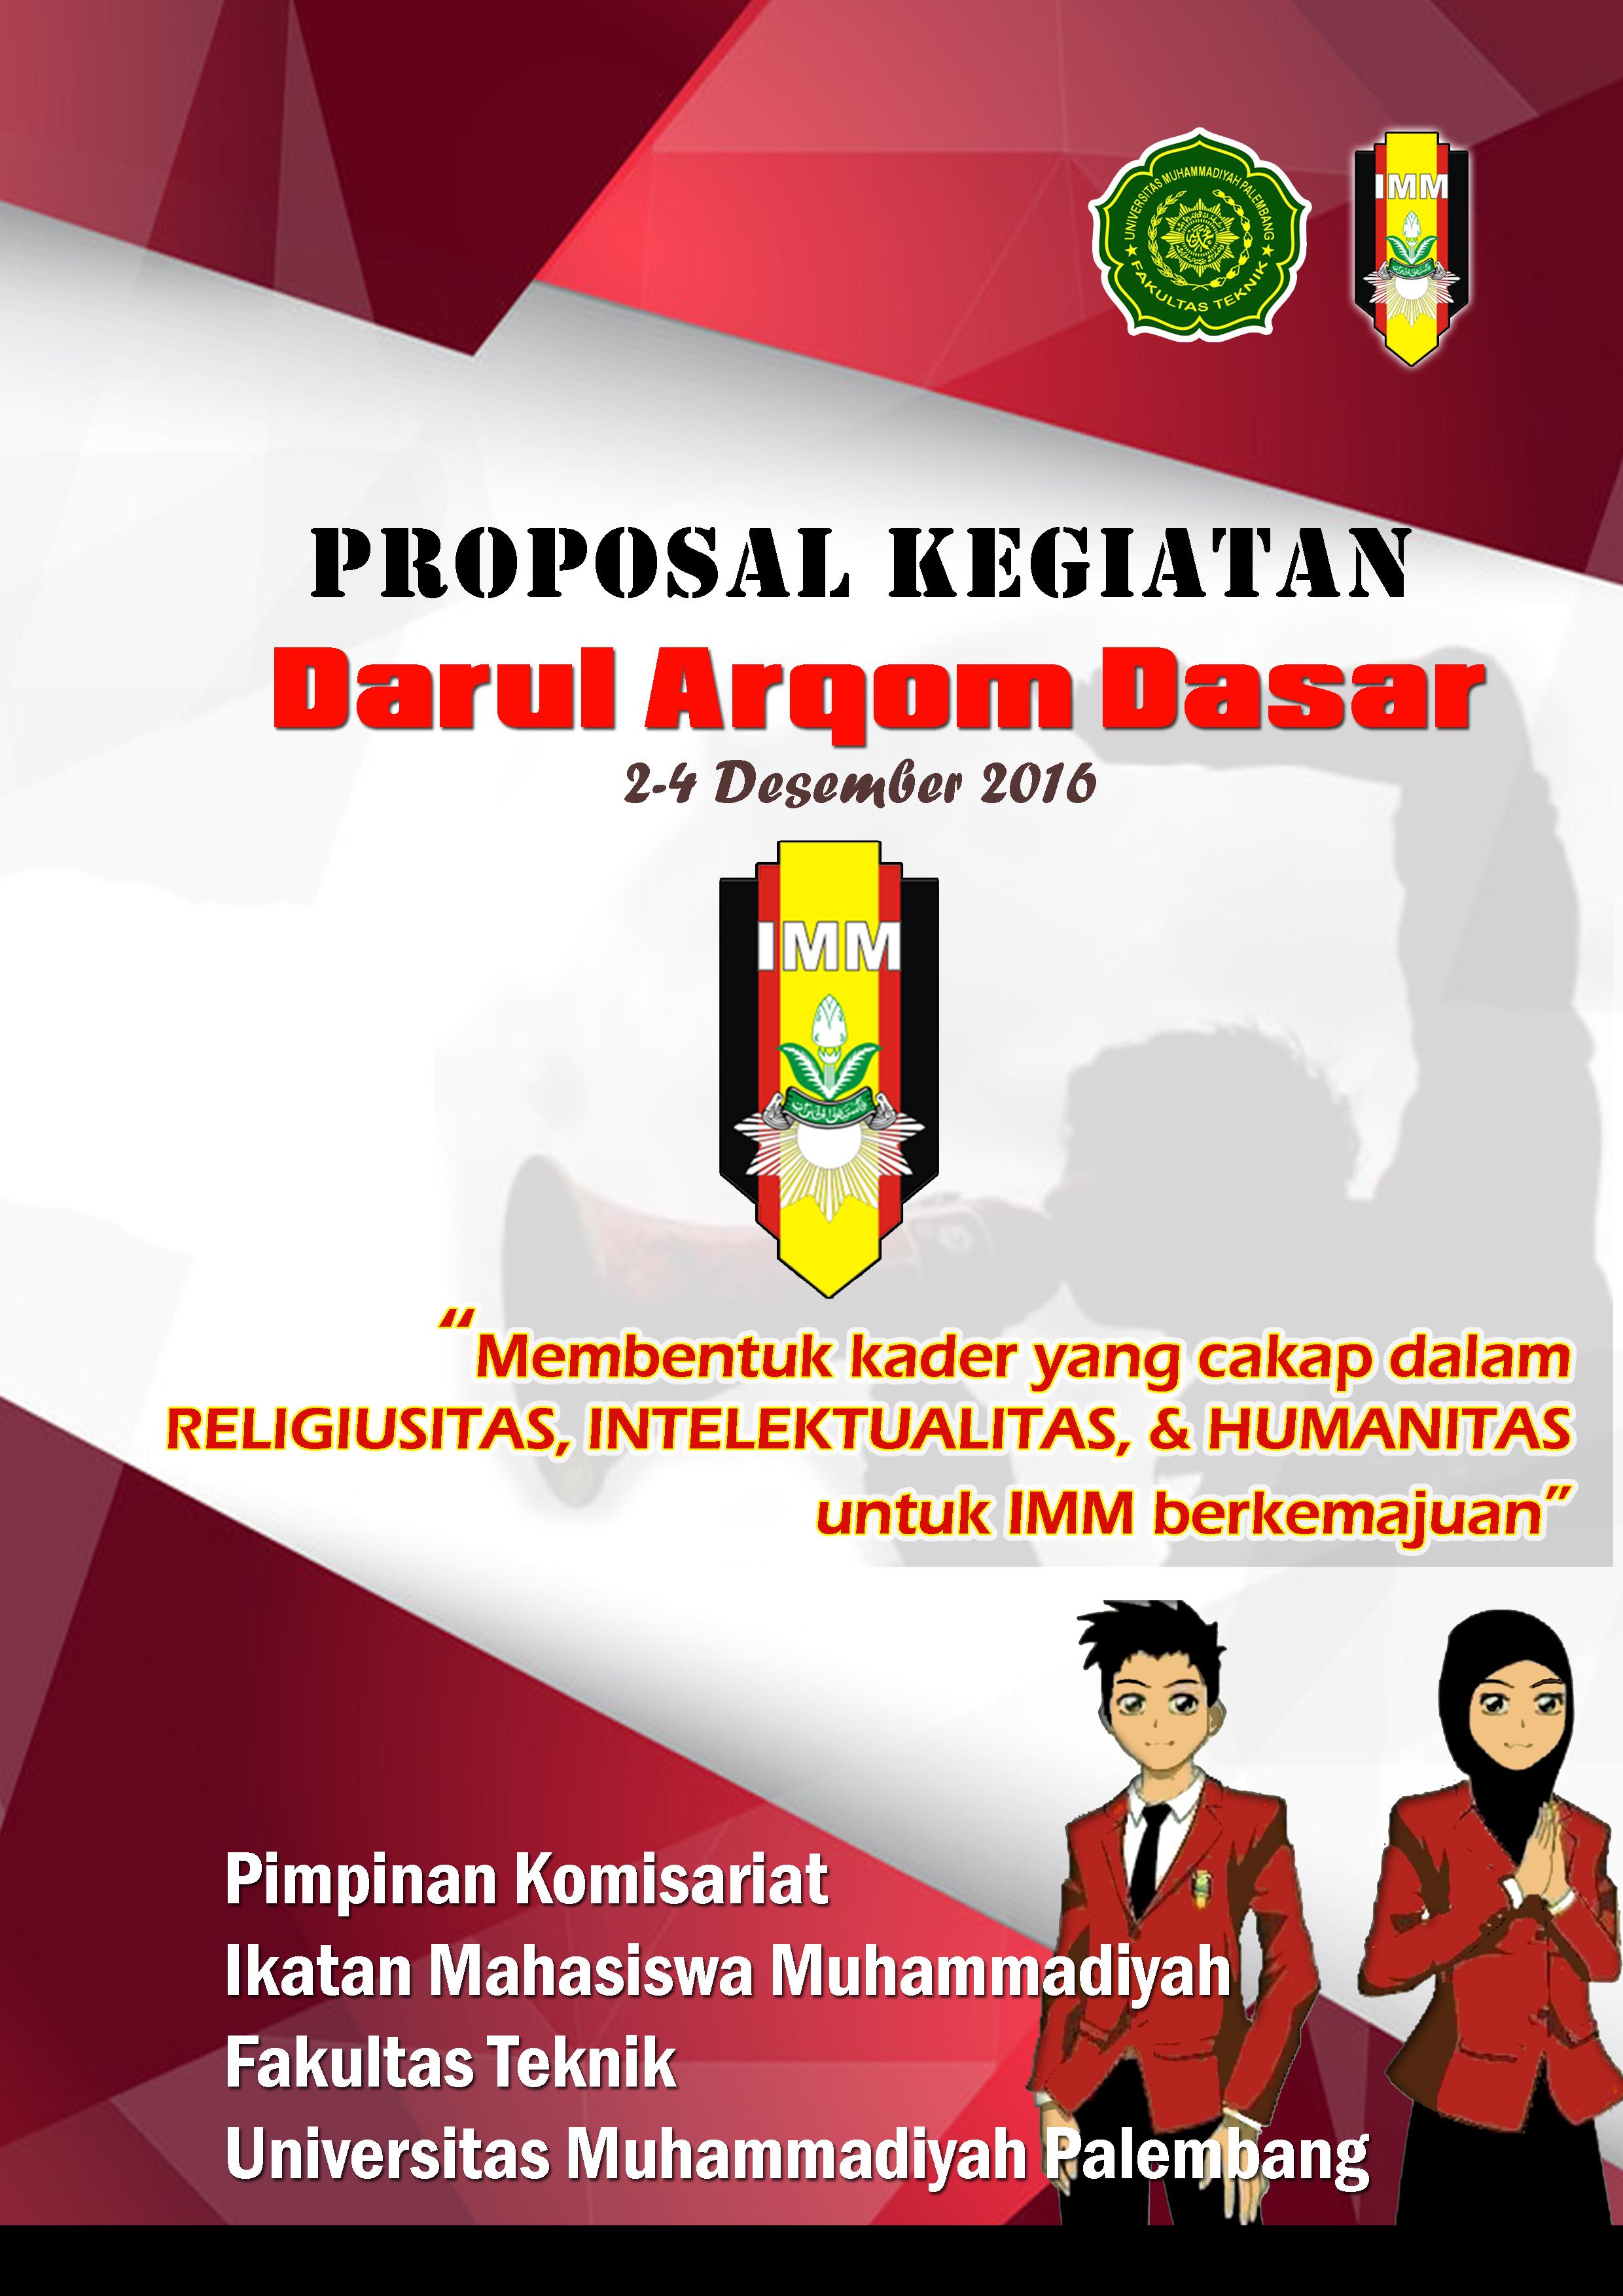 Contoh Cover Proposal  PK IMM FT UM Palembang